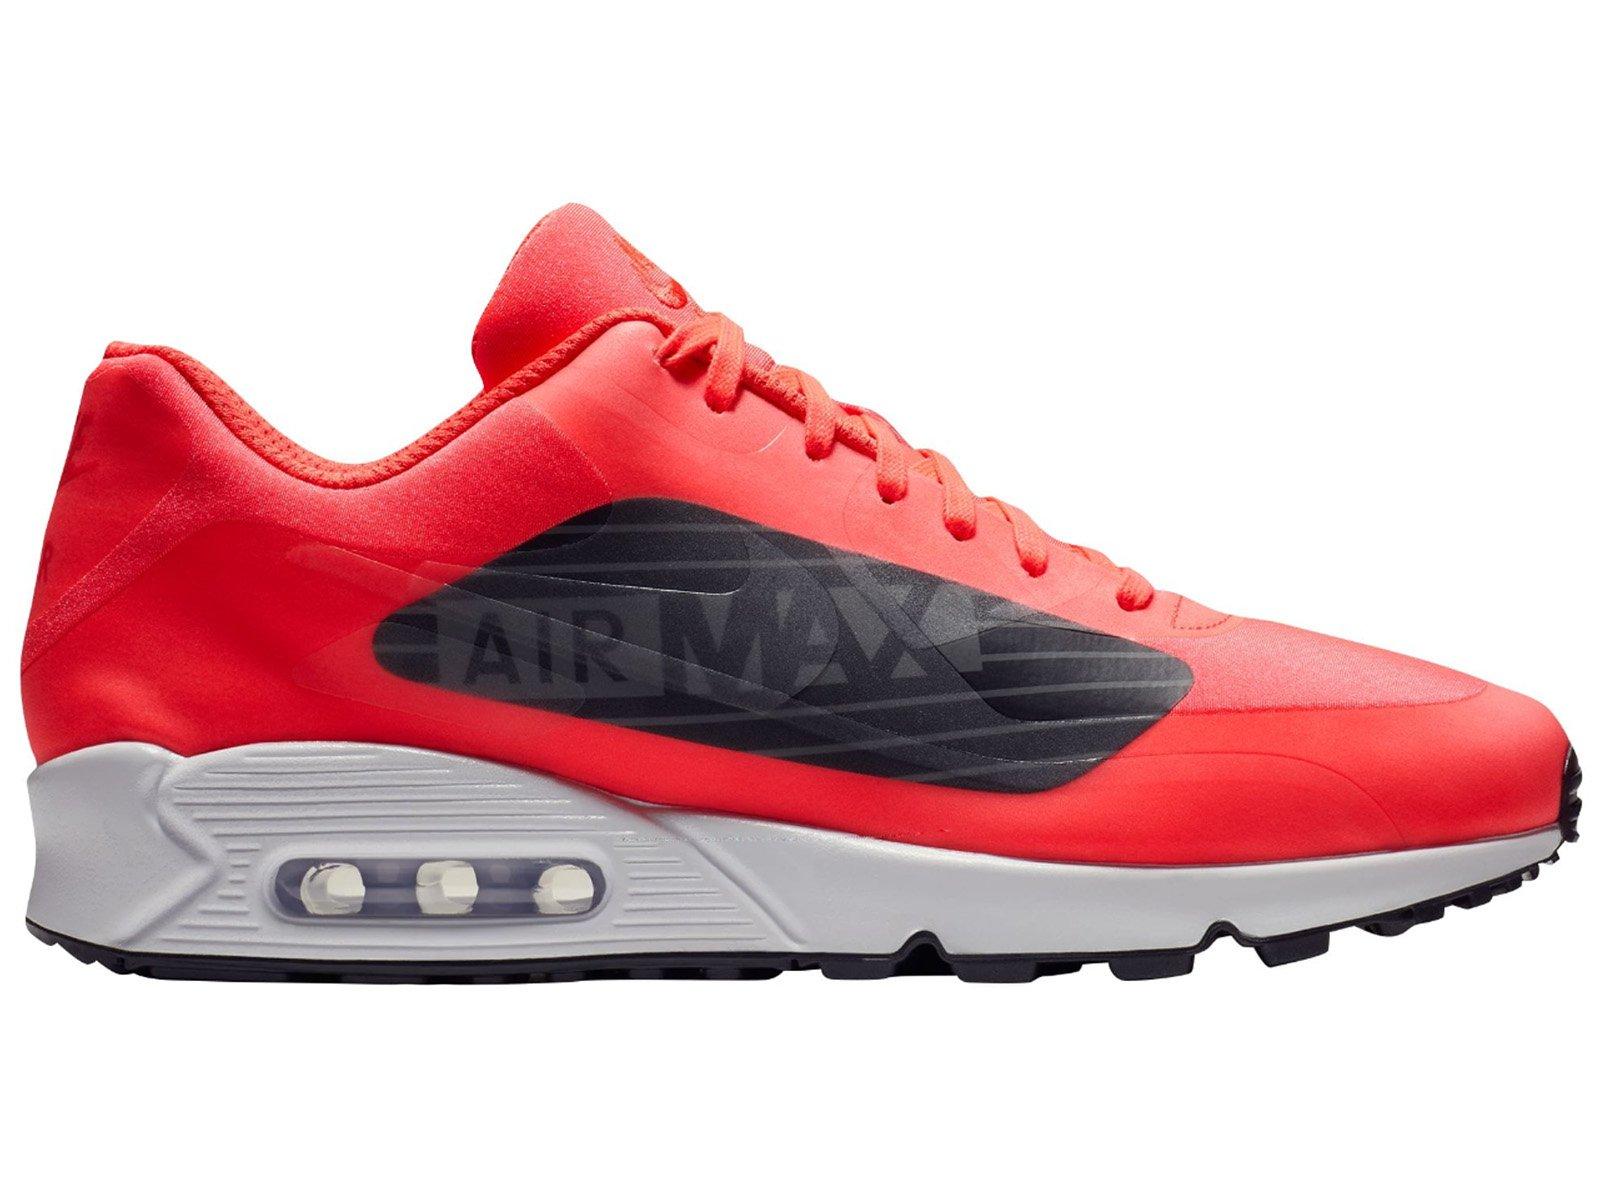 promo code d1b70 1f2c6 Galleon - NIKE Men s Air Max 90 NS GPX SP Bright Crimson Black White Dark  Grey Synthetic Running Shoes 14 D(M) US